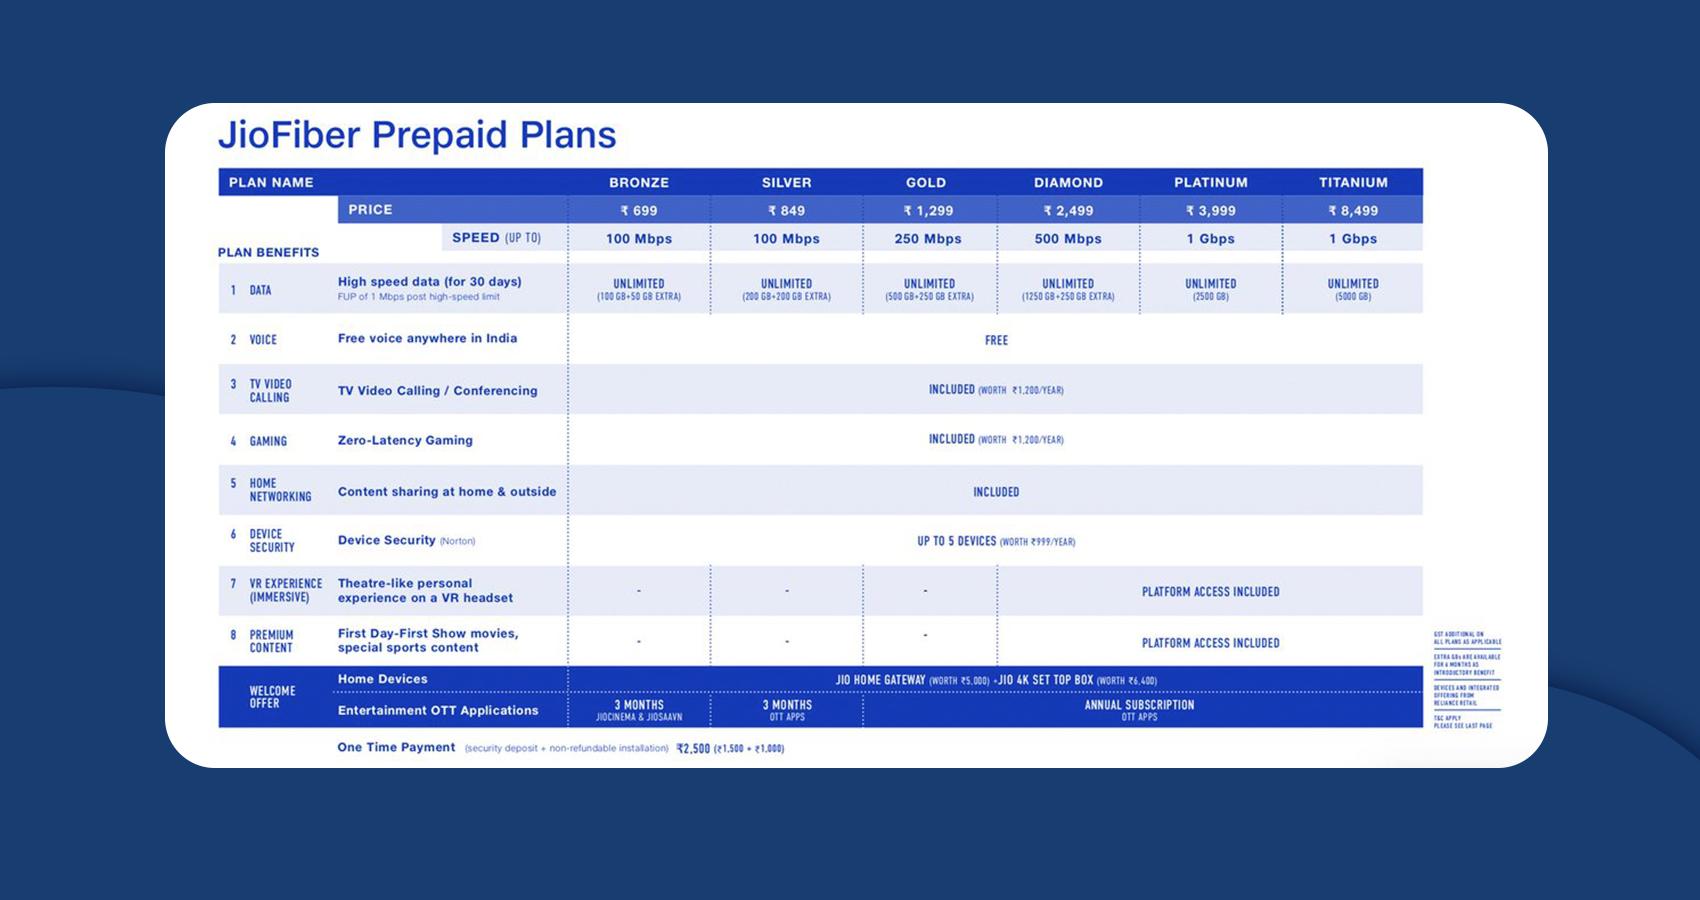 jio-fiber_prepaid-plans_by-appsinvo